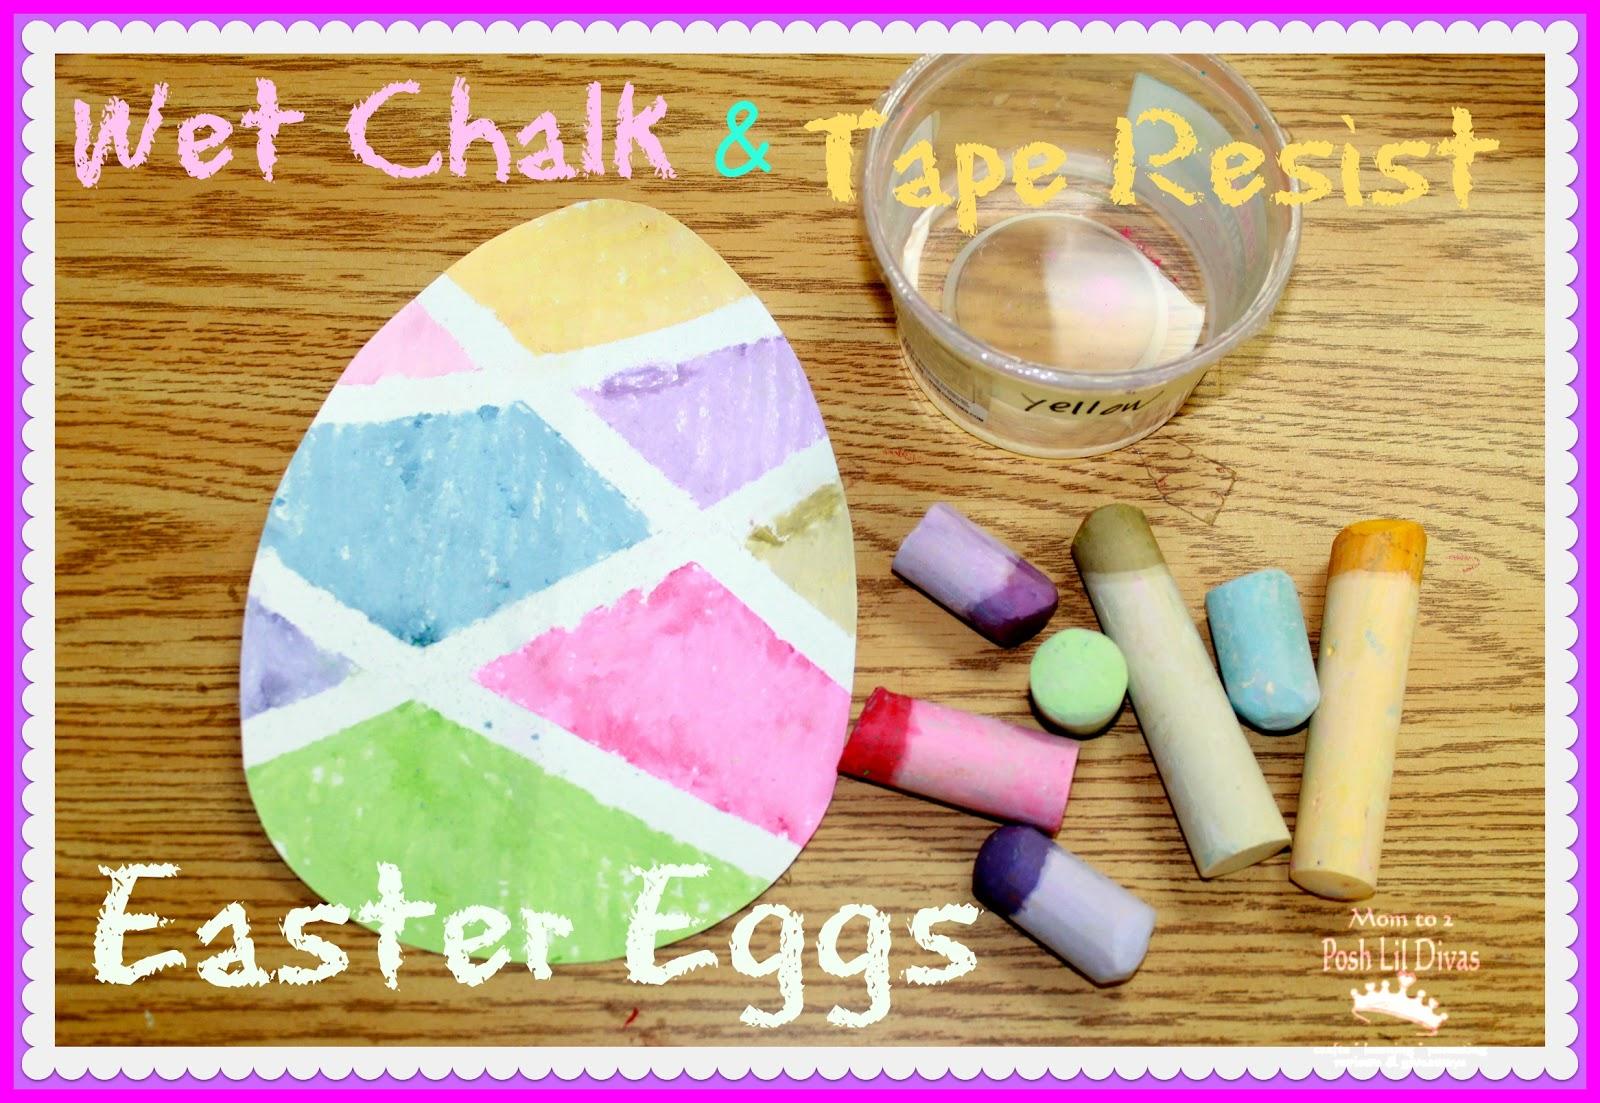 Mom To 2 Posh Lil Divas Wet Chalk Tape Resist Easter Egg Painting